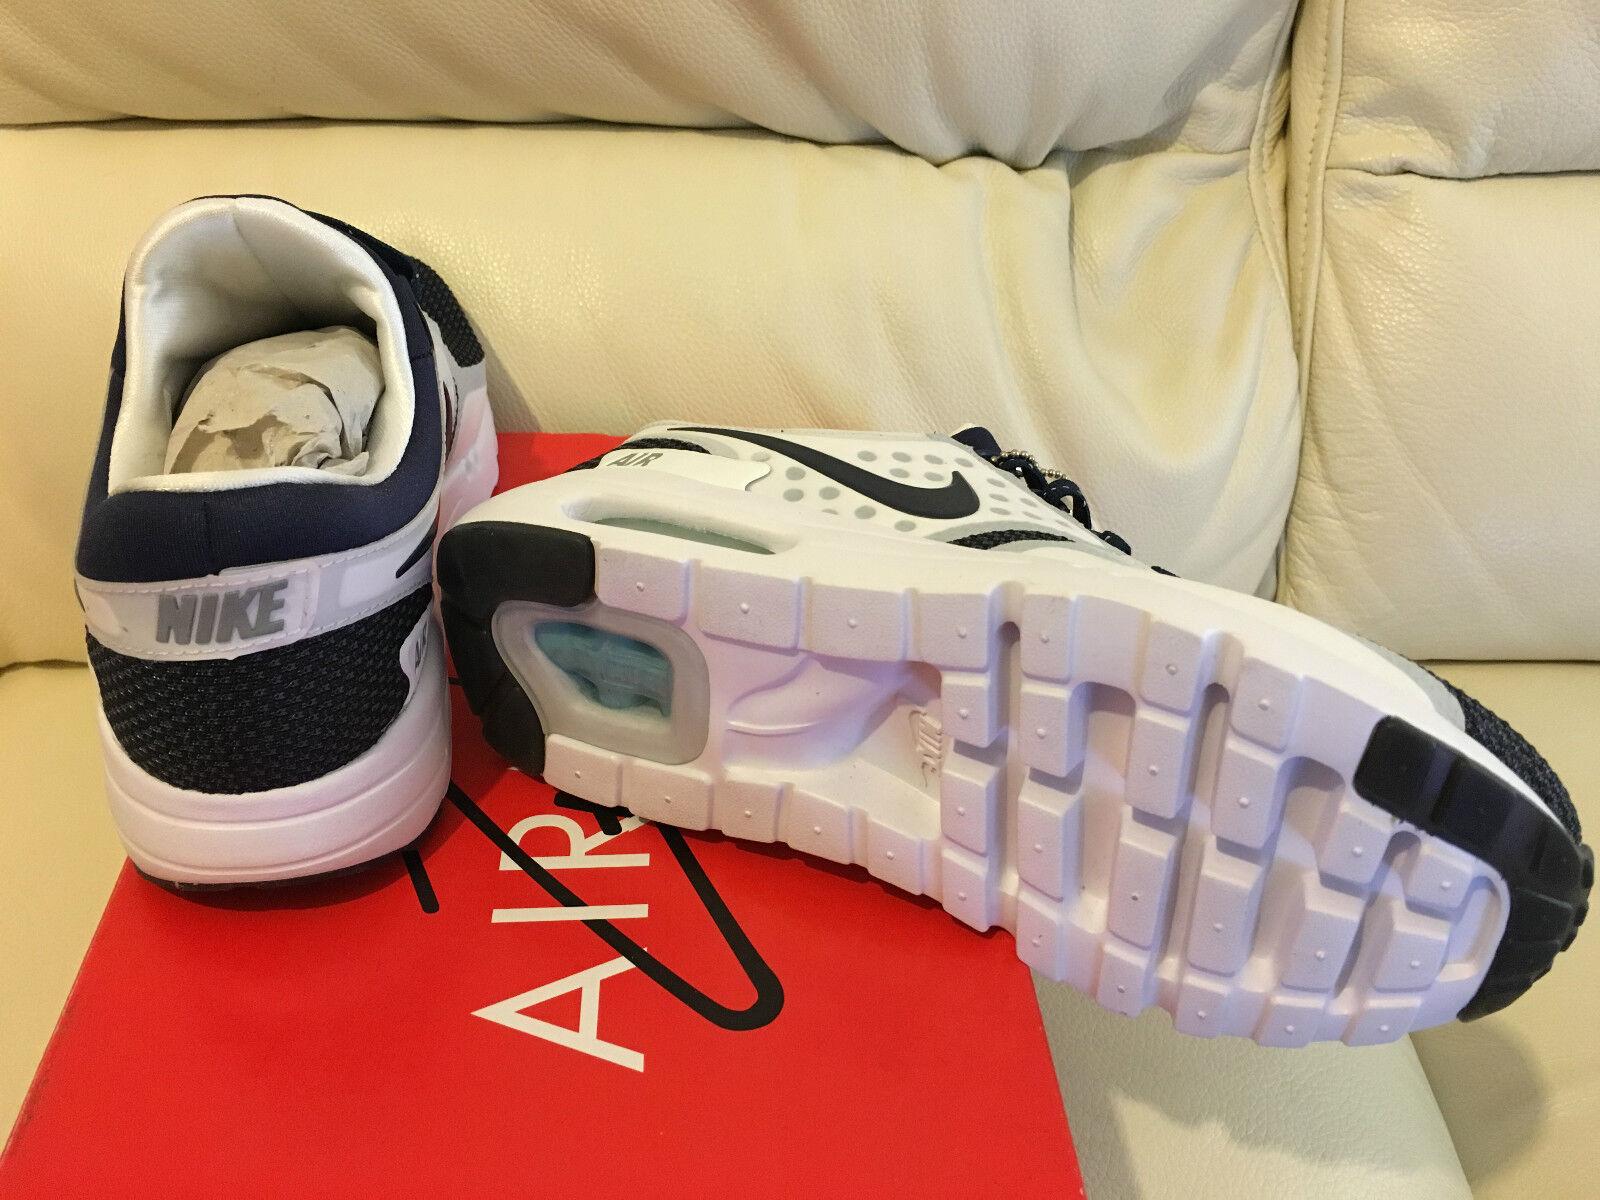 new product dde41 f20e9 ... NIKE AIR MAX ZERO Baskets Baskets Baskets Baskets Chaussures Taille  NEUF 842d39 ...